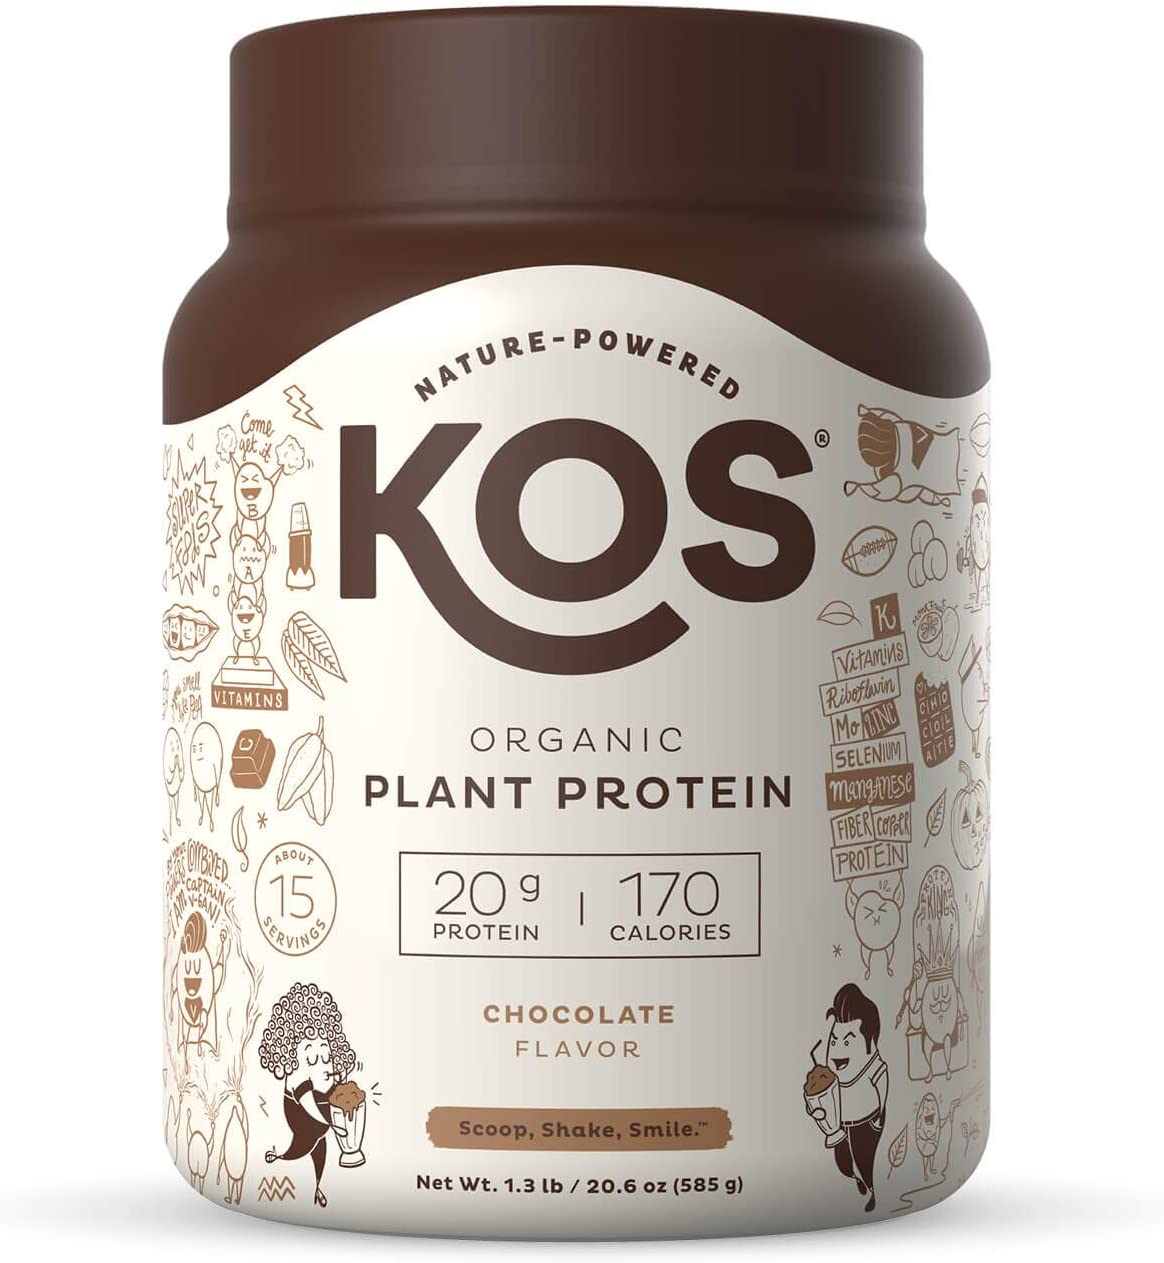 KOS Proteína en polvo orgánico a base de plantas - Mezcla de proteínas veganas orgánicas crudas, 1.3 libras, 15 porciones, 15 Servings, 1